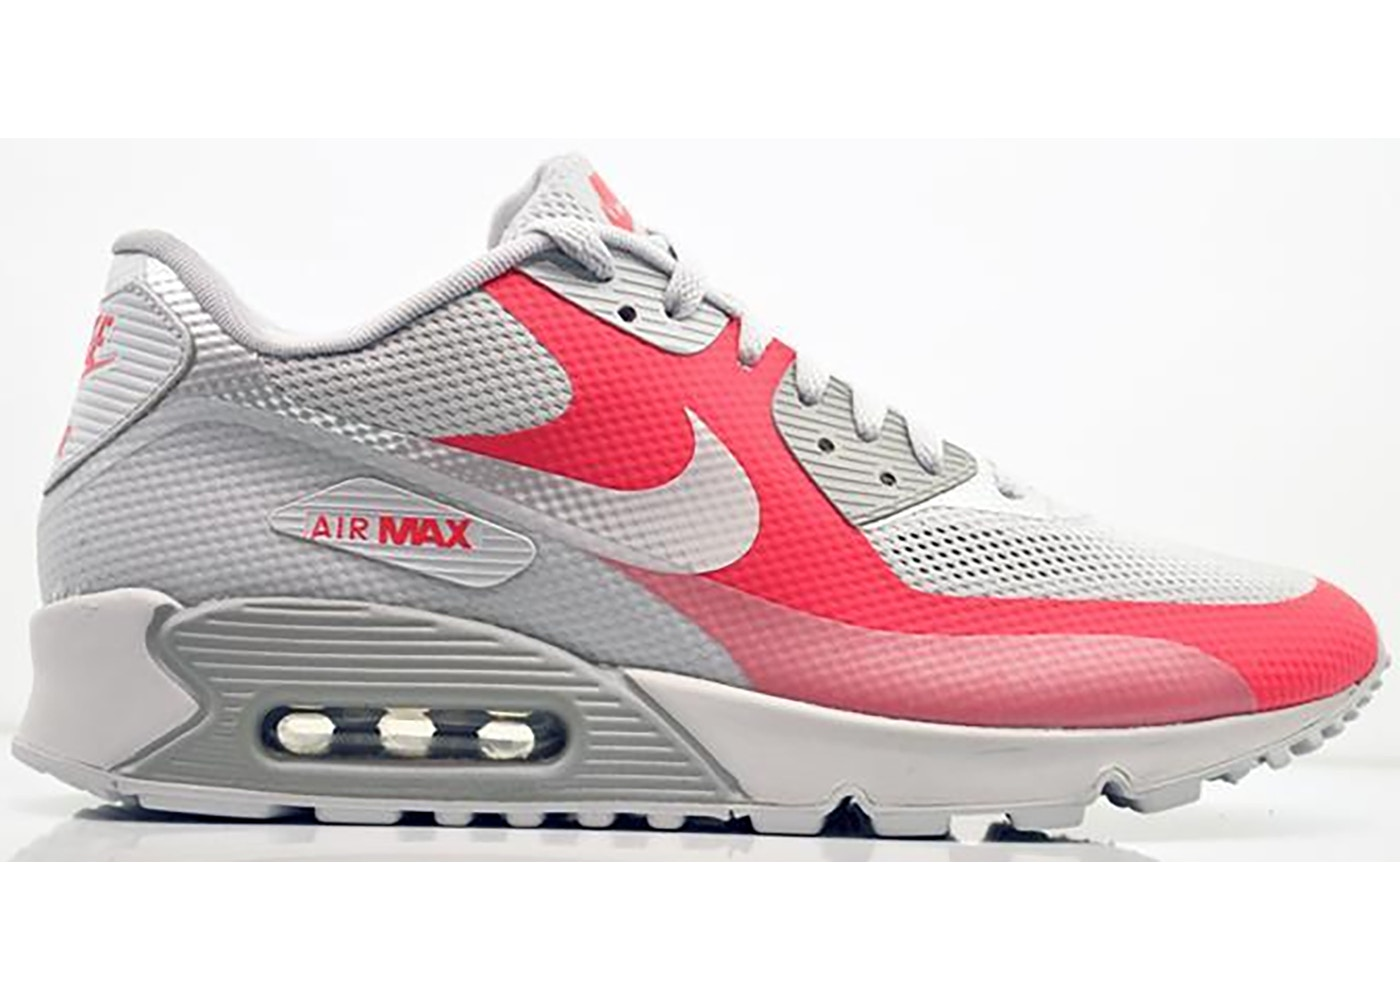 Nike Air Max 90 Hyperfuse Grey Solar Red